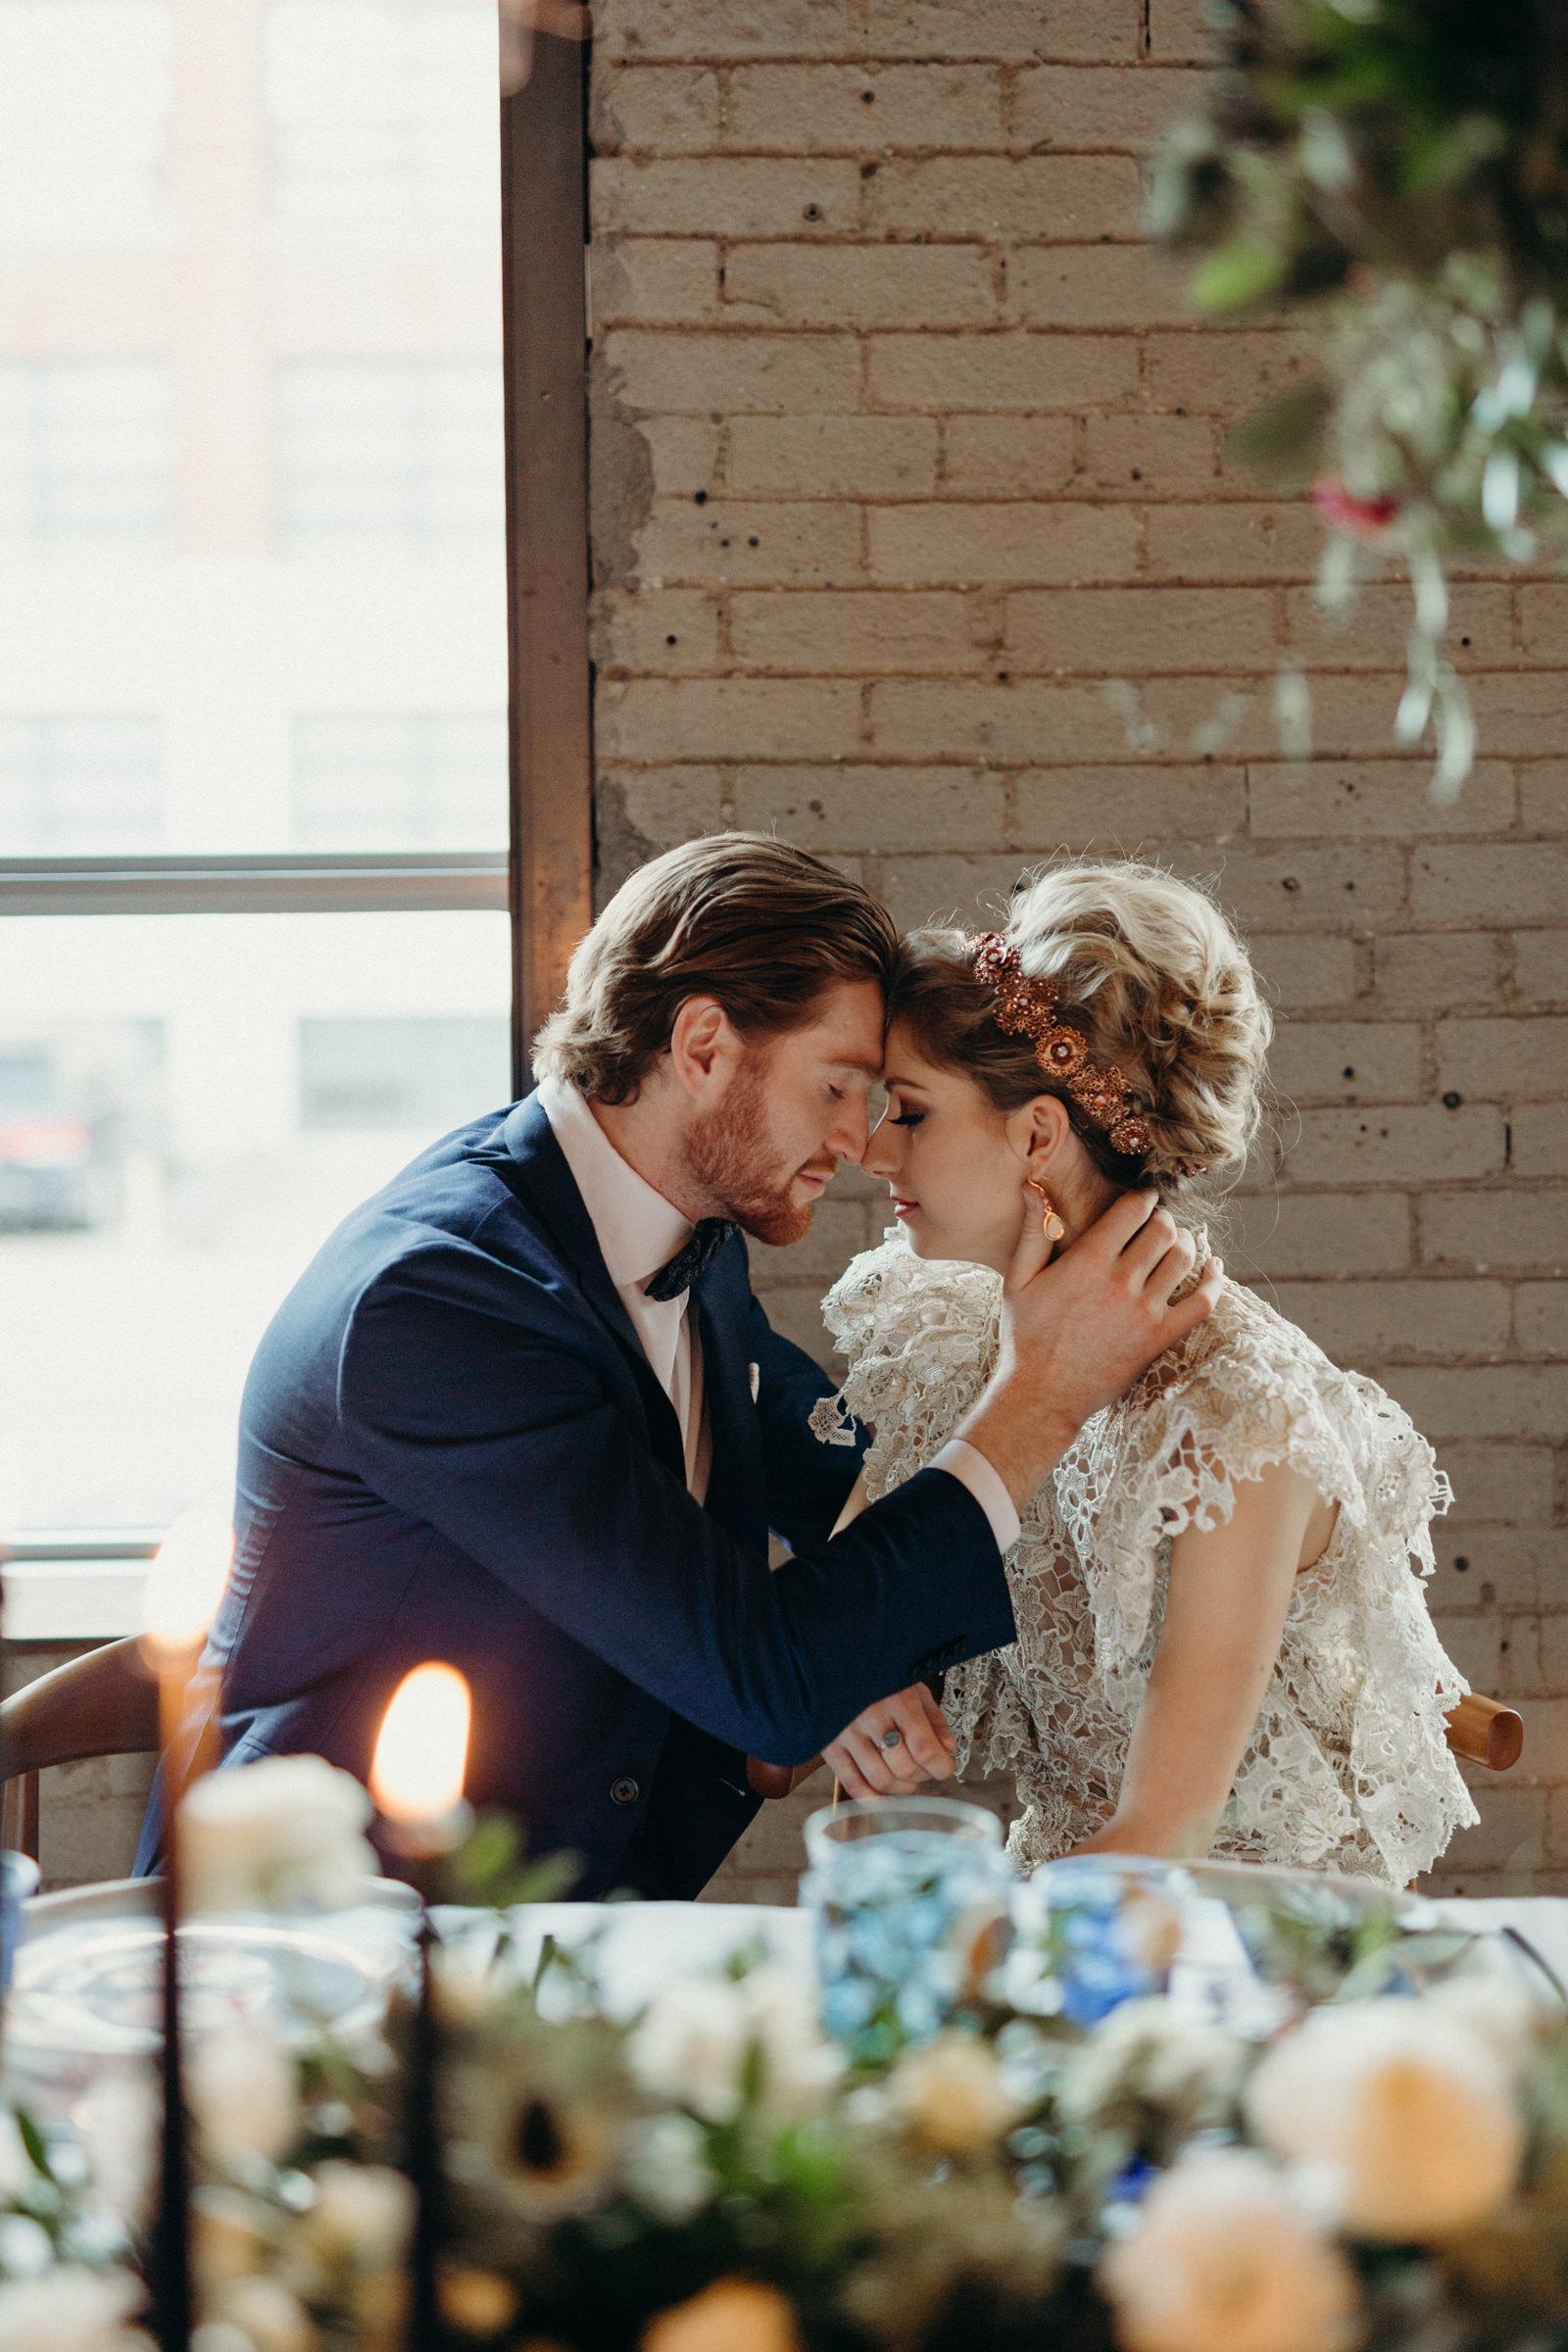 marcucci+photography+hotel+ocho+wedding+toronto-440.jpg